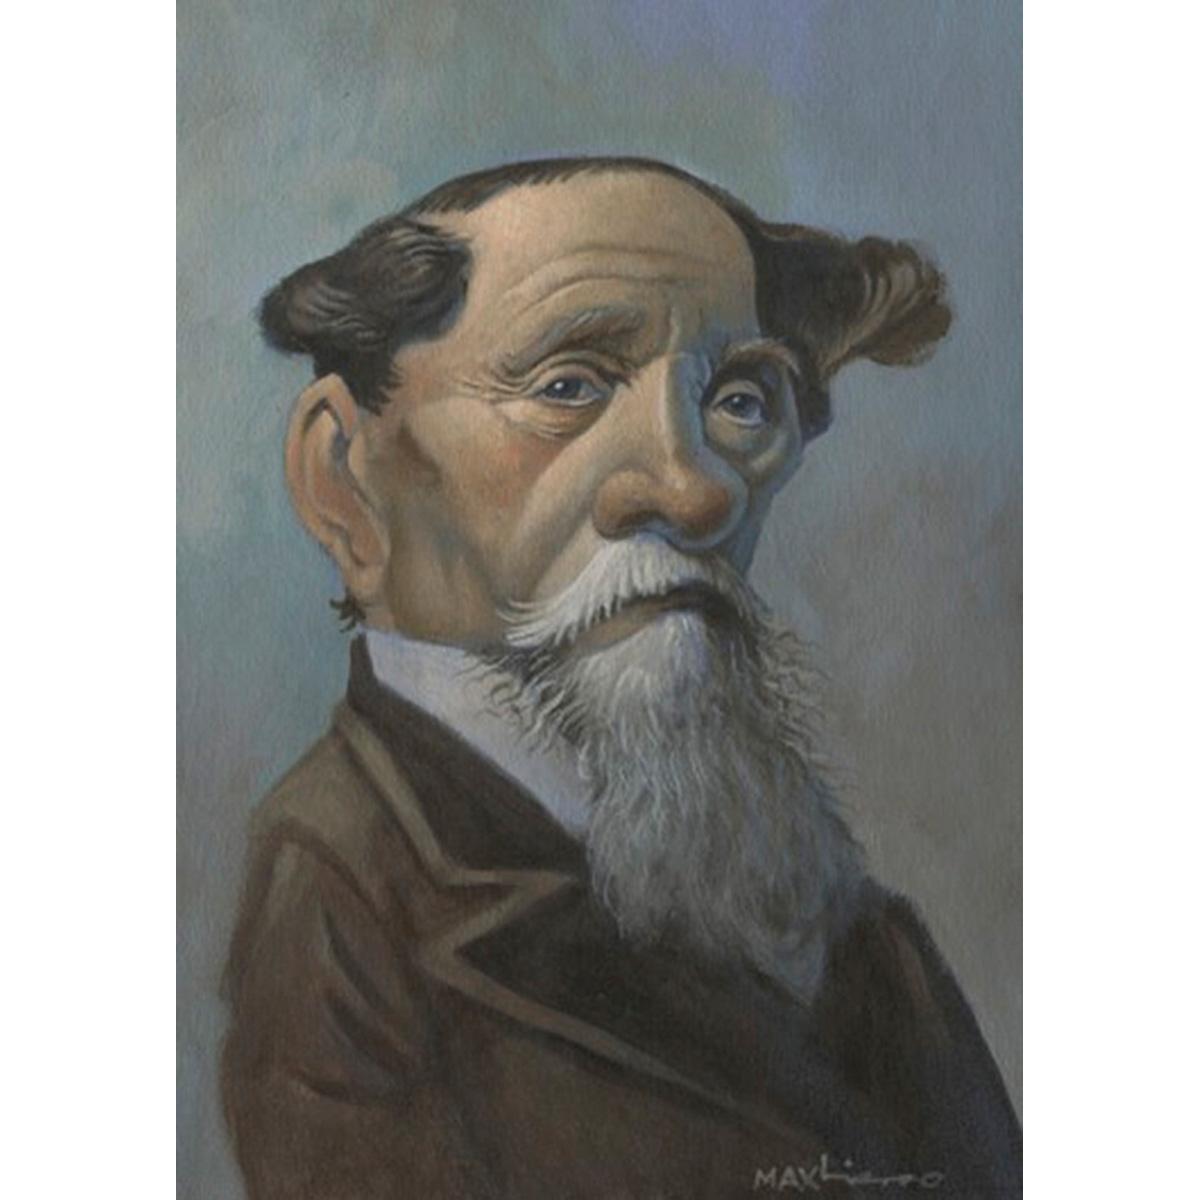 MAX HIERRO - Dickens